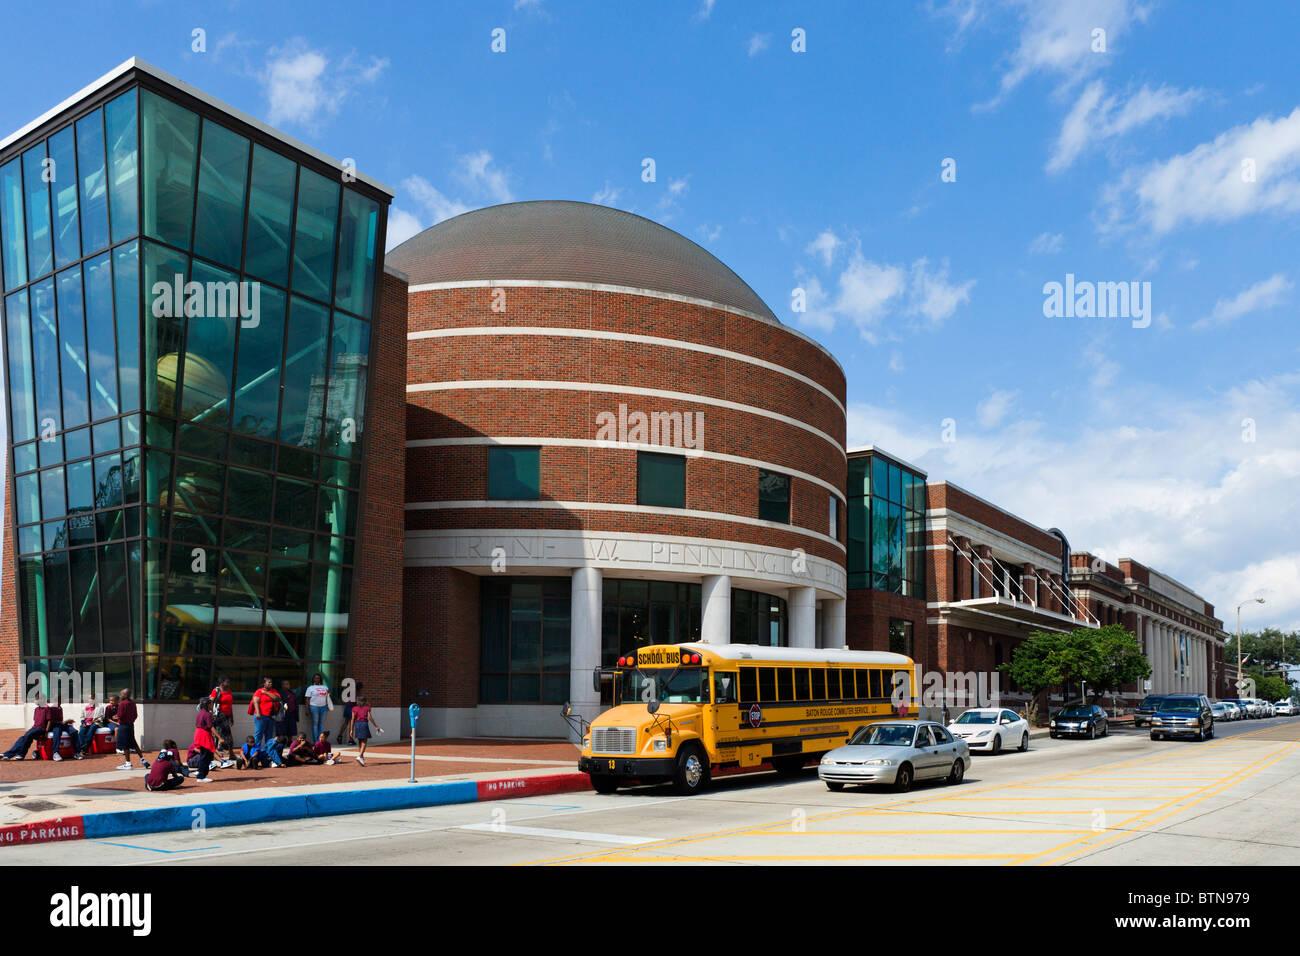 The Pennington Planetarium at the Louisiana Art and Science Museum, River Road, Baton Rouge, Lousiana, USA - Stock Image